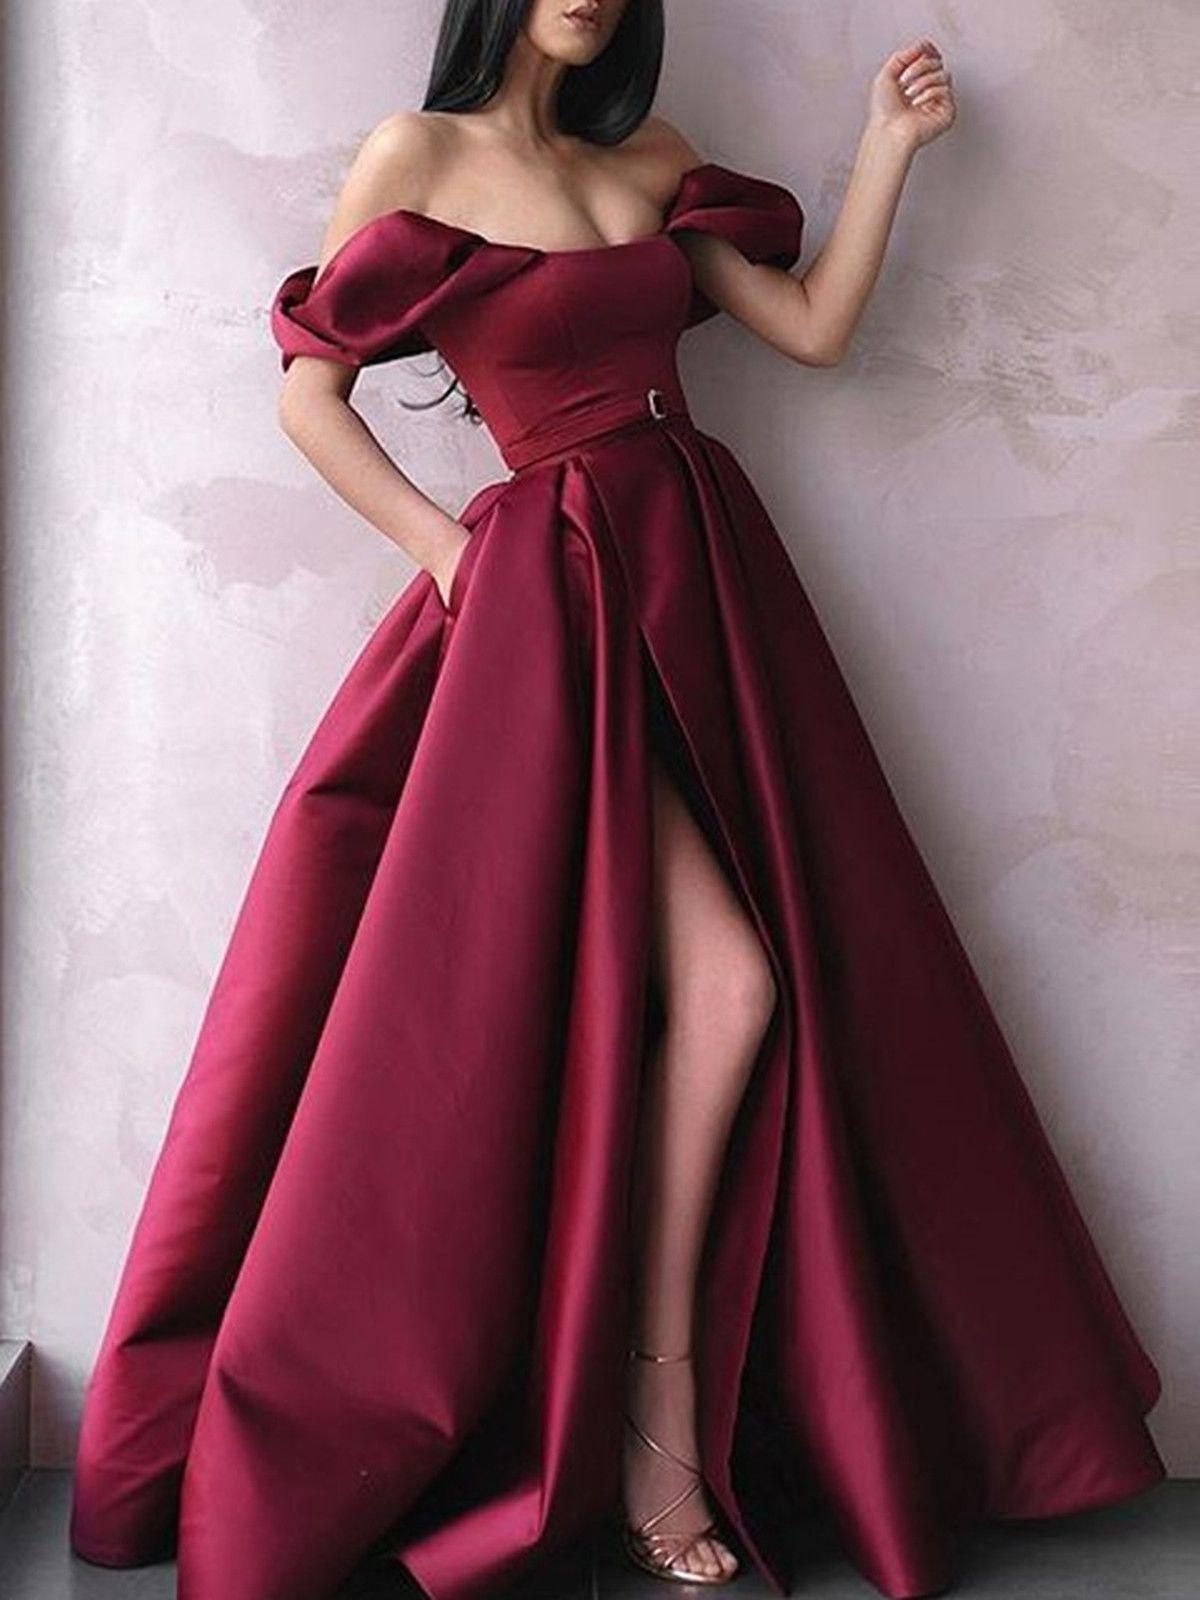 Attire ideas princess prom dresses bridal party dress, fashion model